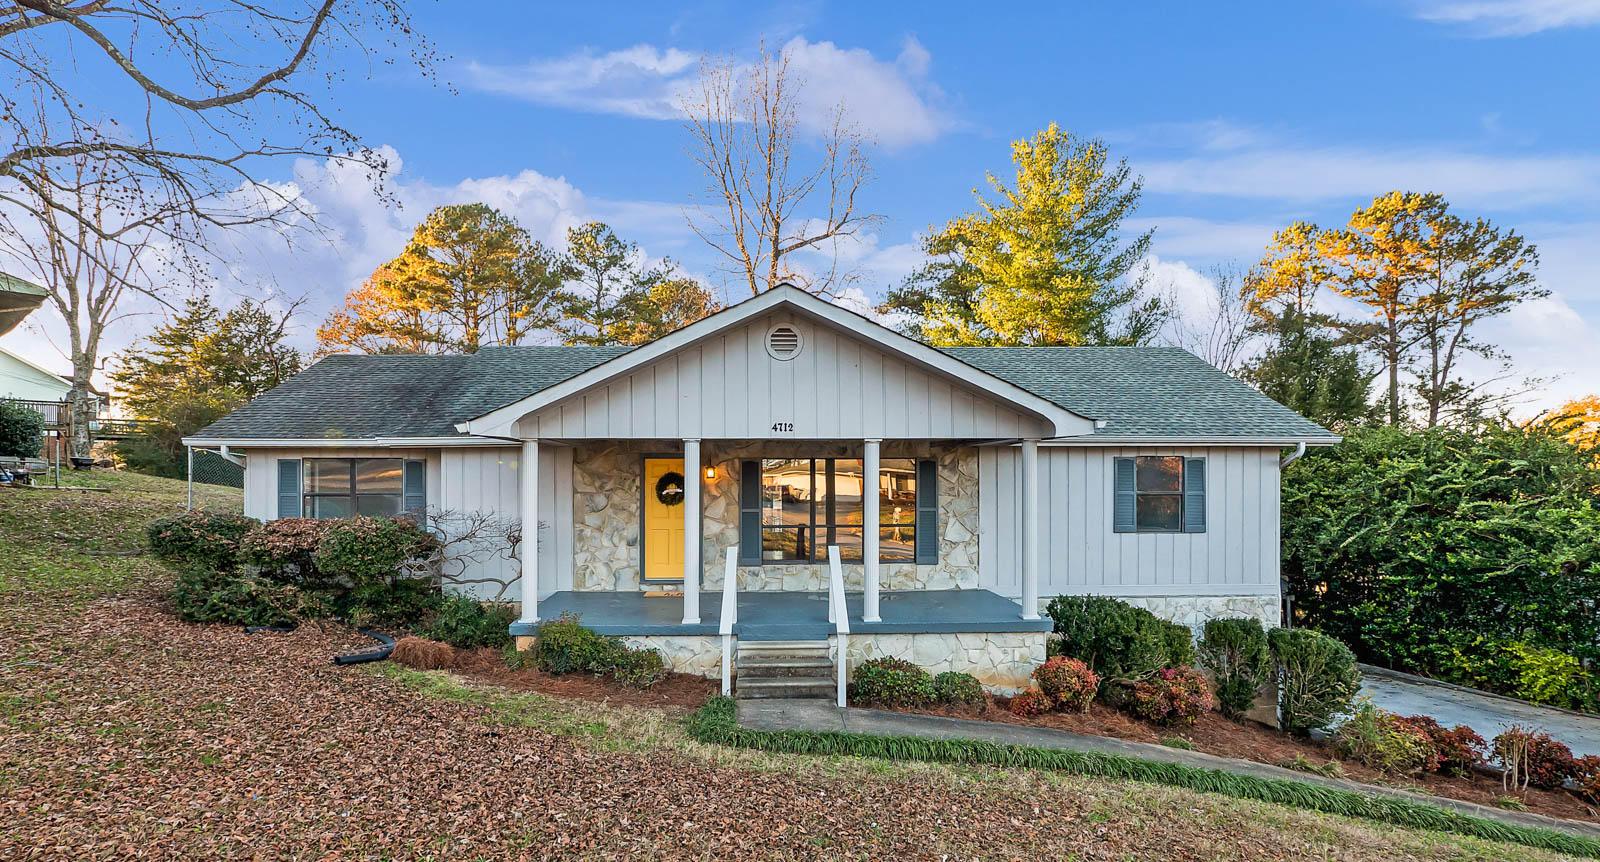 4712 Tarpon Tr, Chattanooga, TN 37416